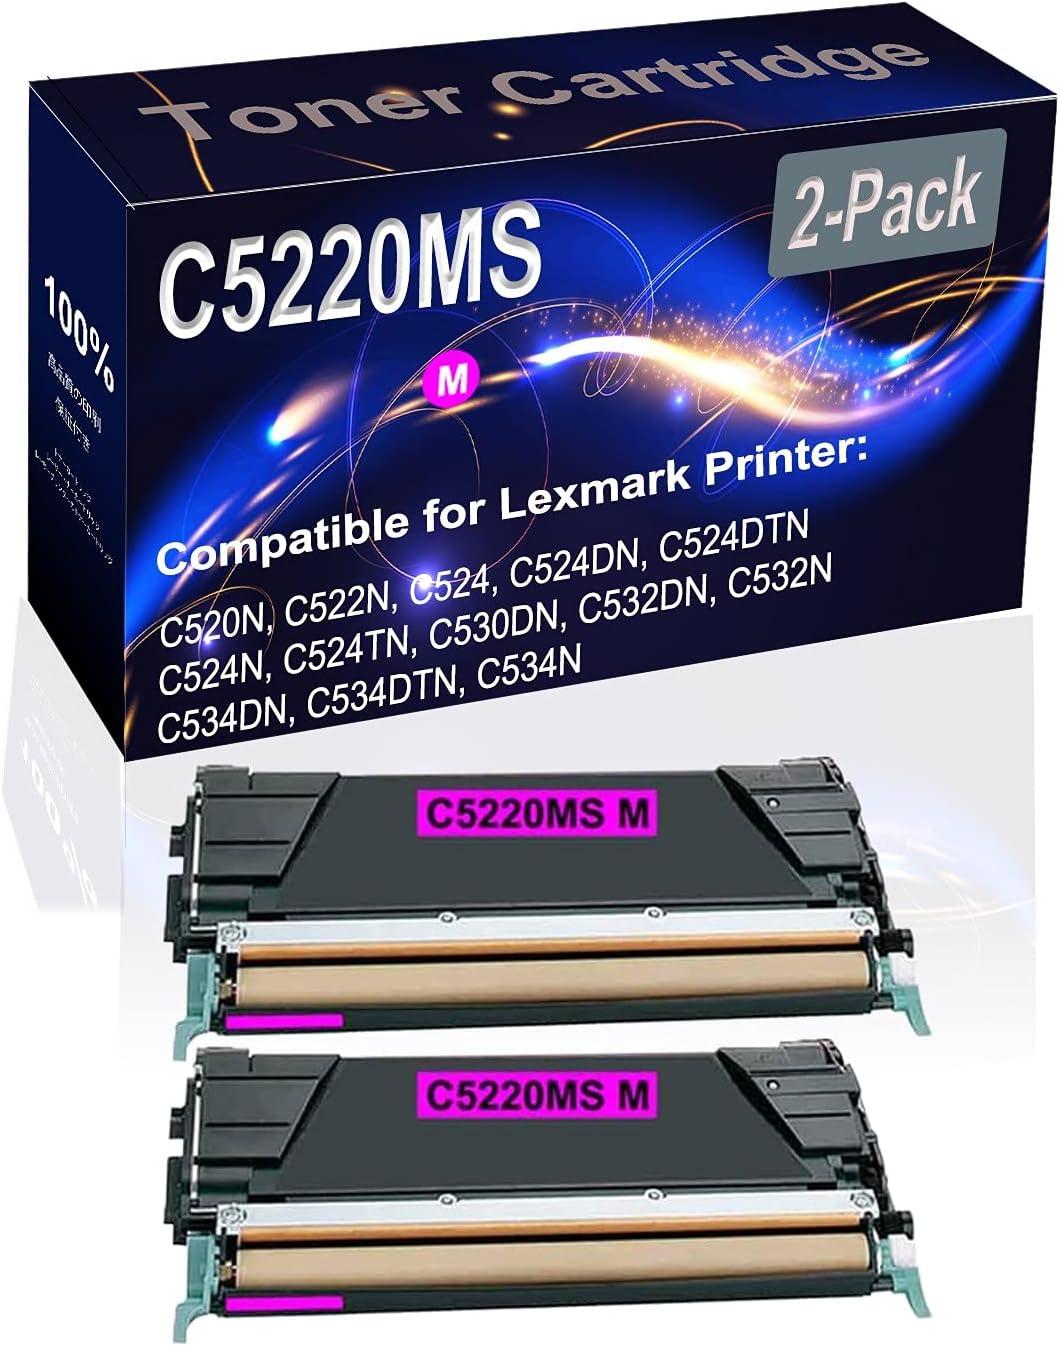 2-Pack (Magenta) Compatible High Yield C5220MS Printer Toner Cartridge use for Lexmark C520N C522N C524 C524DN Printers